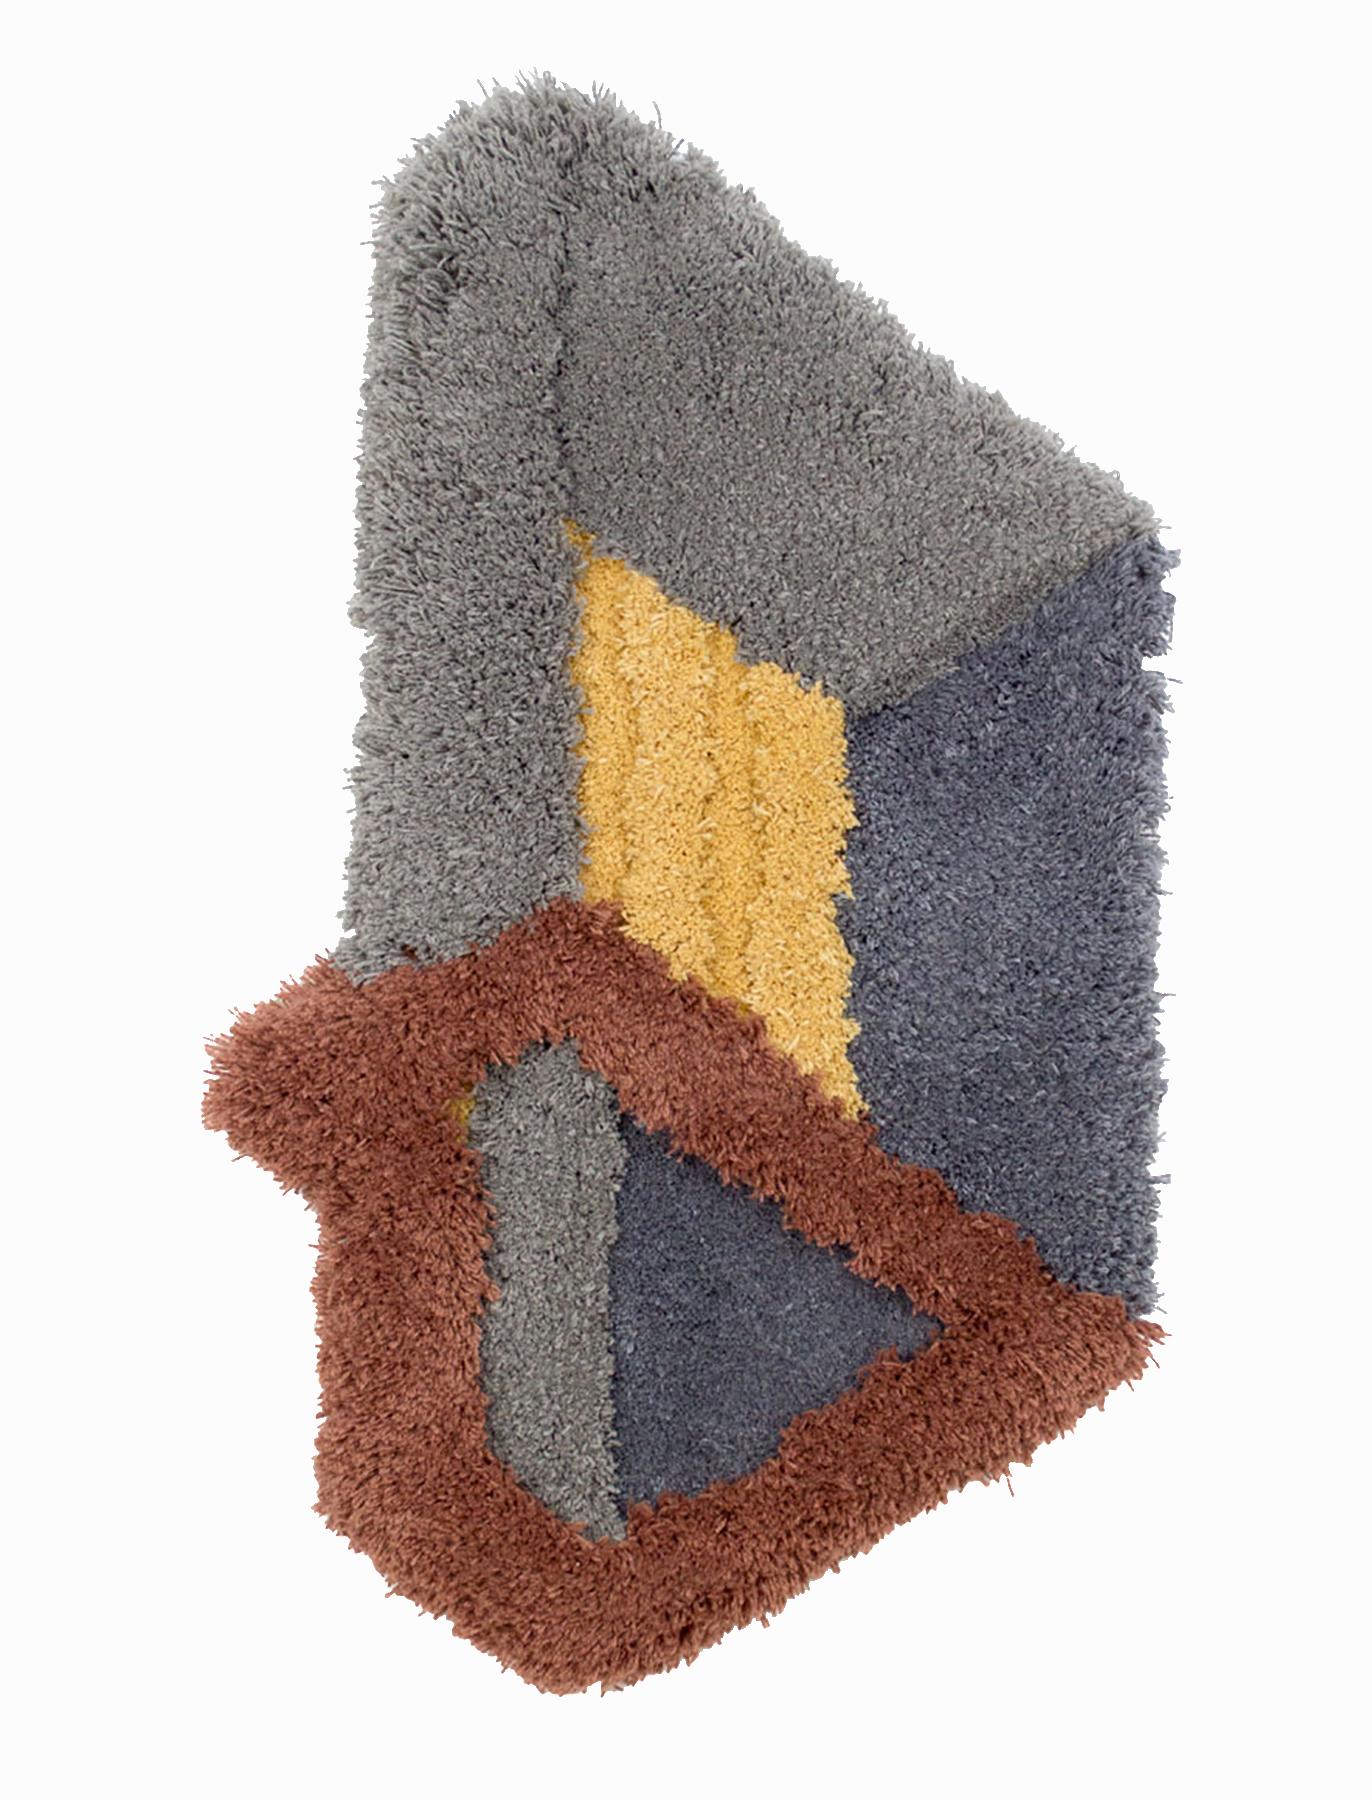 Corner Illusion, 37 x 21 inches / 94 x 53.3 cm, wool yarn on wood panel, 2019